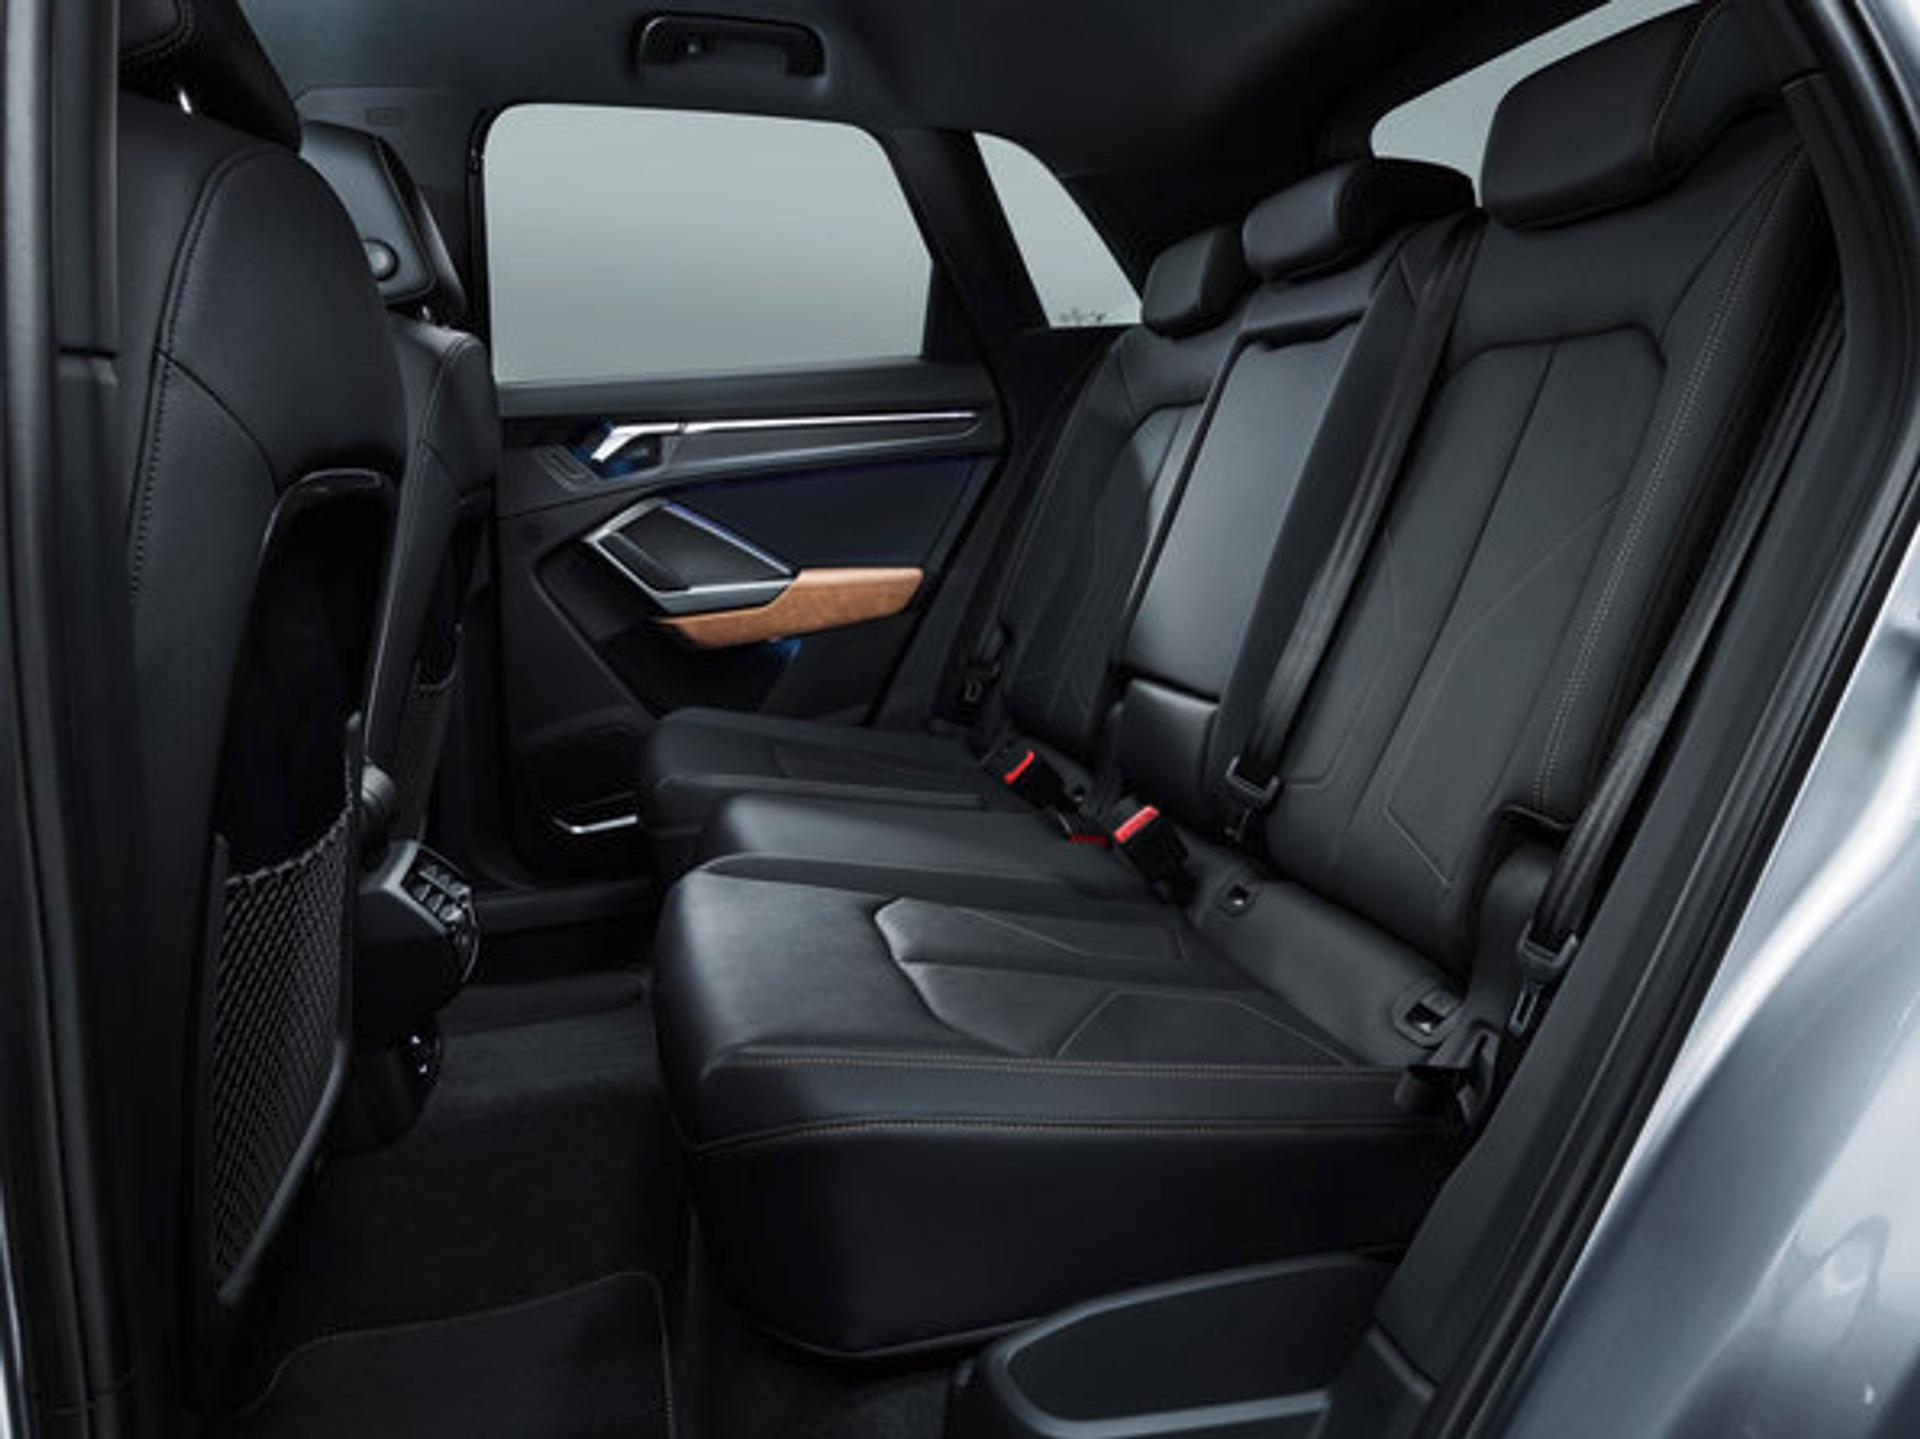 Audi Q3 rear row seats